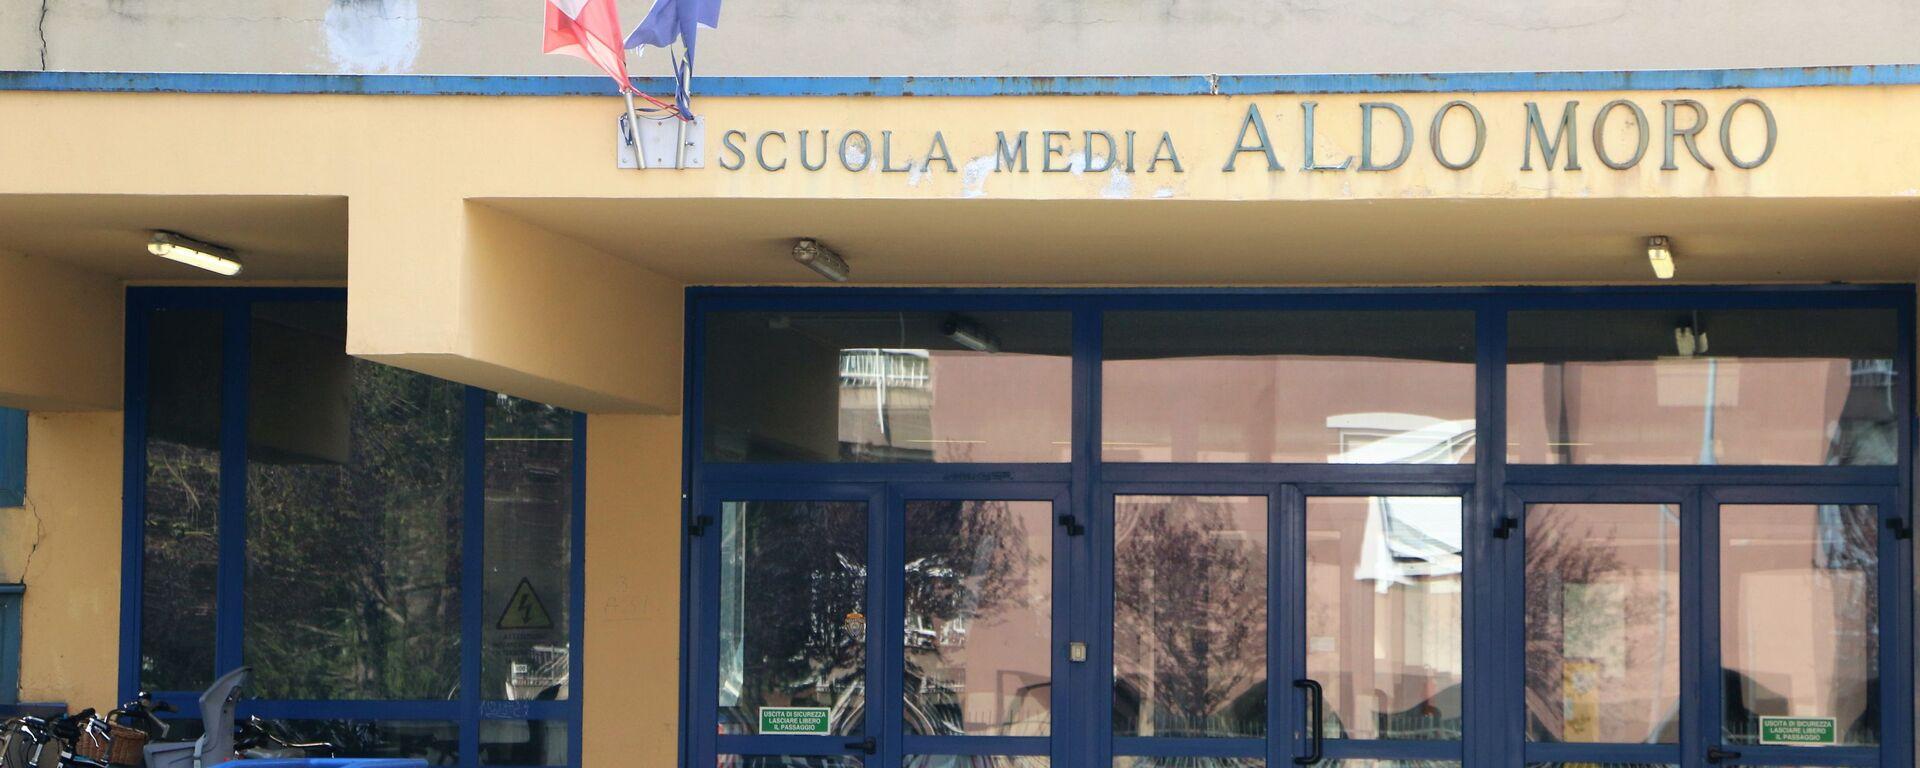 Scuola media Aldo Moro - Sputnik Italia, 1920, 20.04.2021